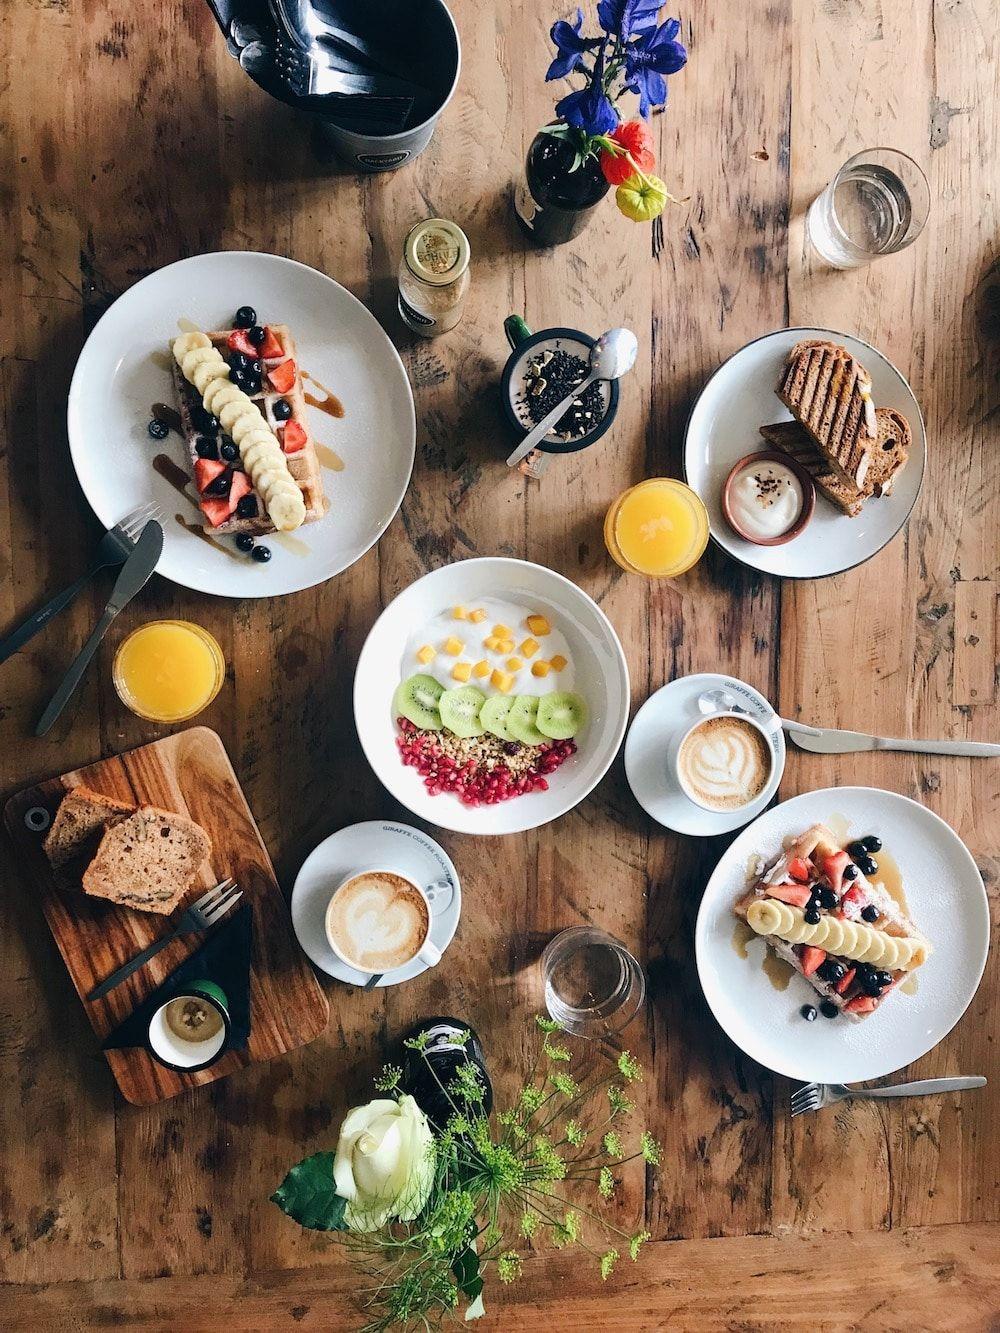 8 Vegan Friendly Breakfast Spots In Rotterdam Weekends In Rotterdam In 2020 Vegan Afternoon Tea Vegan Restaurant Options Vegan Soda